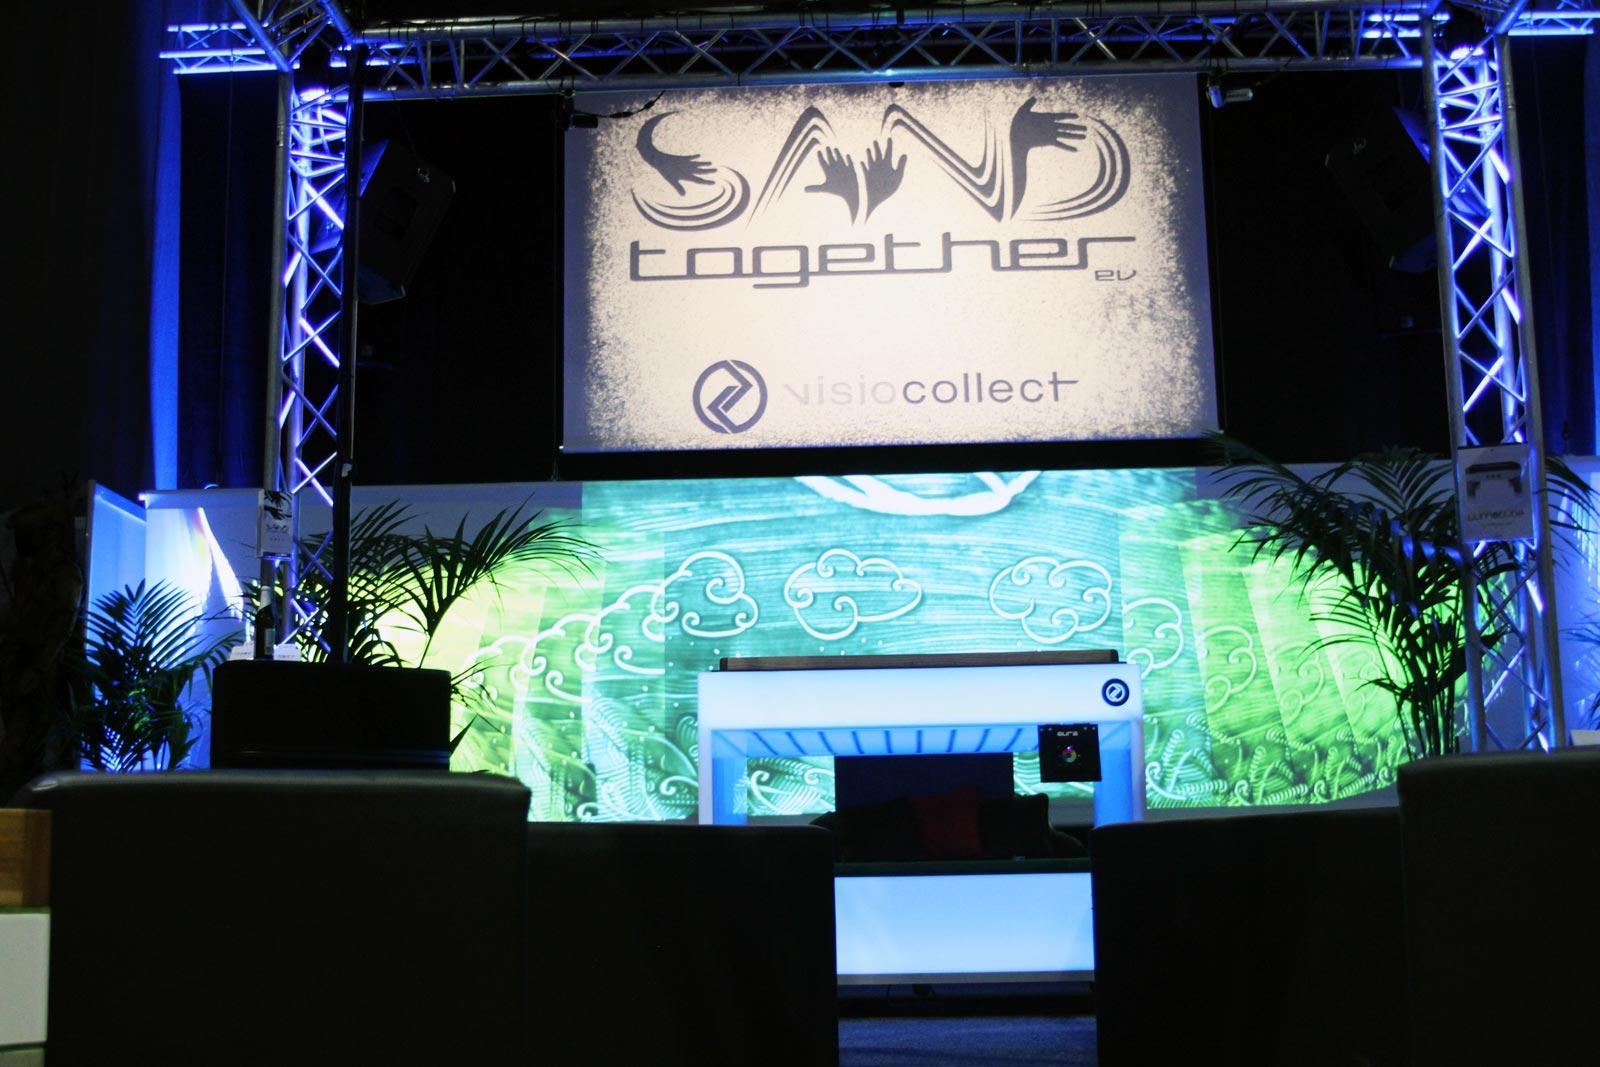 Sandlabor IKF 2015